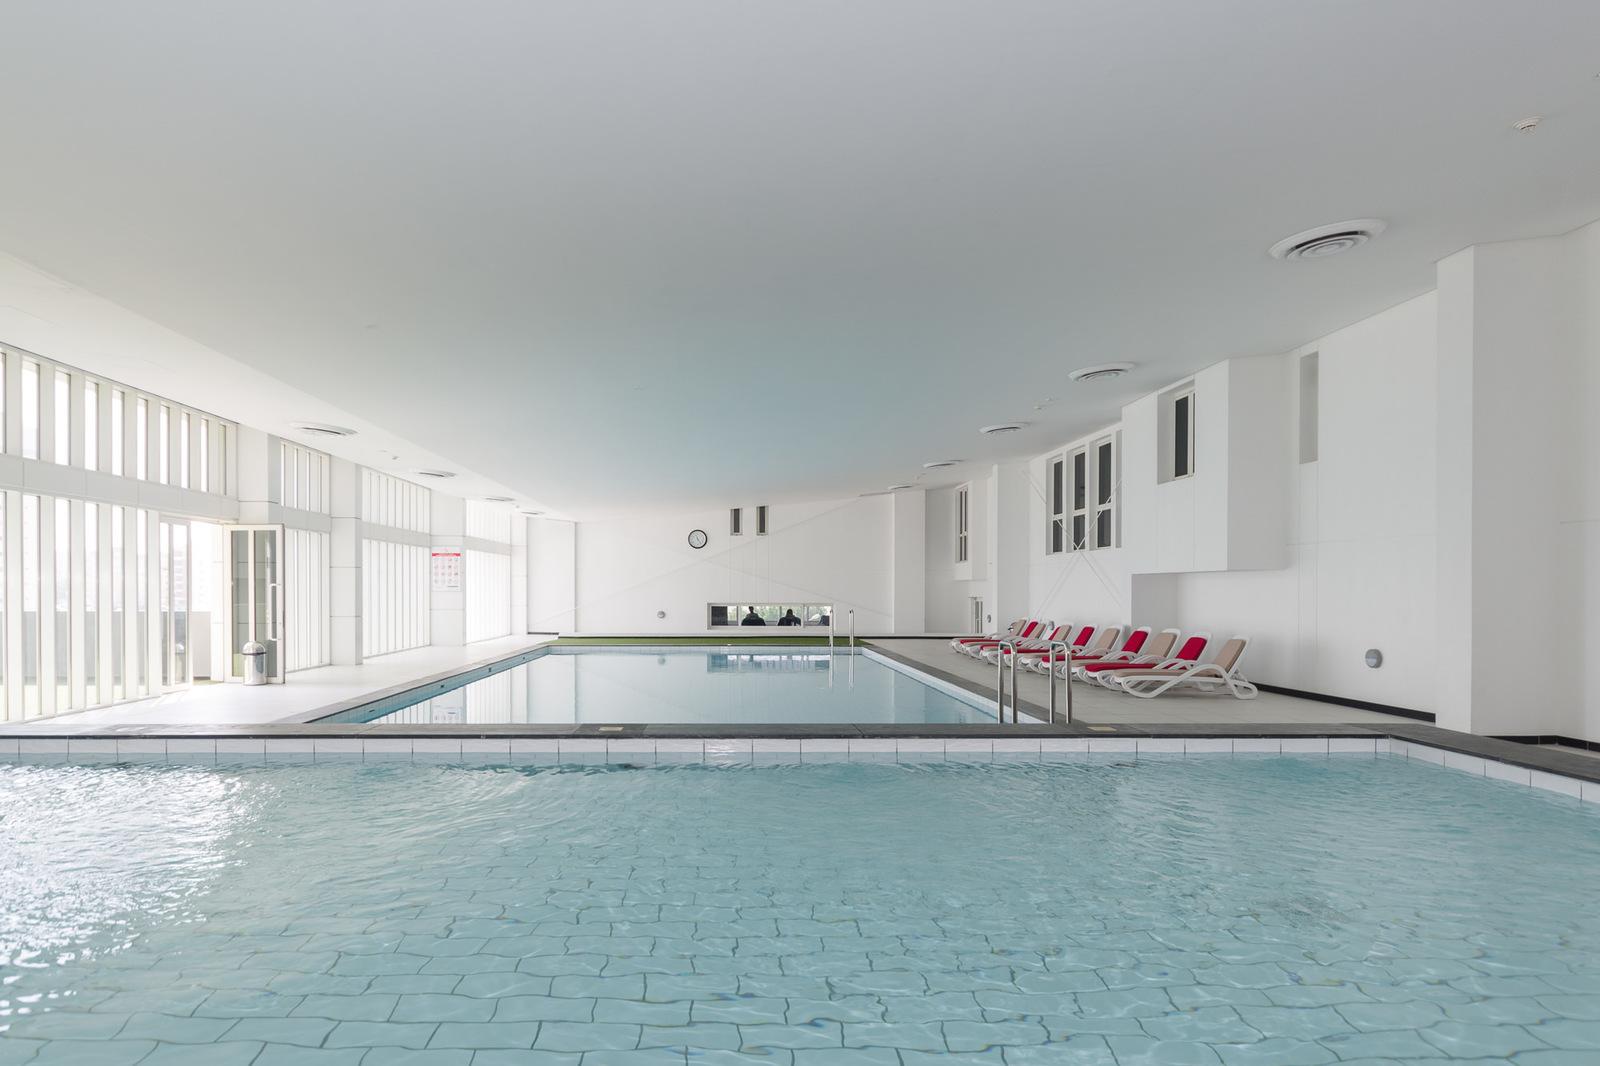 Sabah Al Salem – modern, unfurnished, three bedroom penthouse w/private terrace